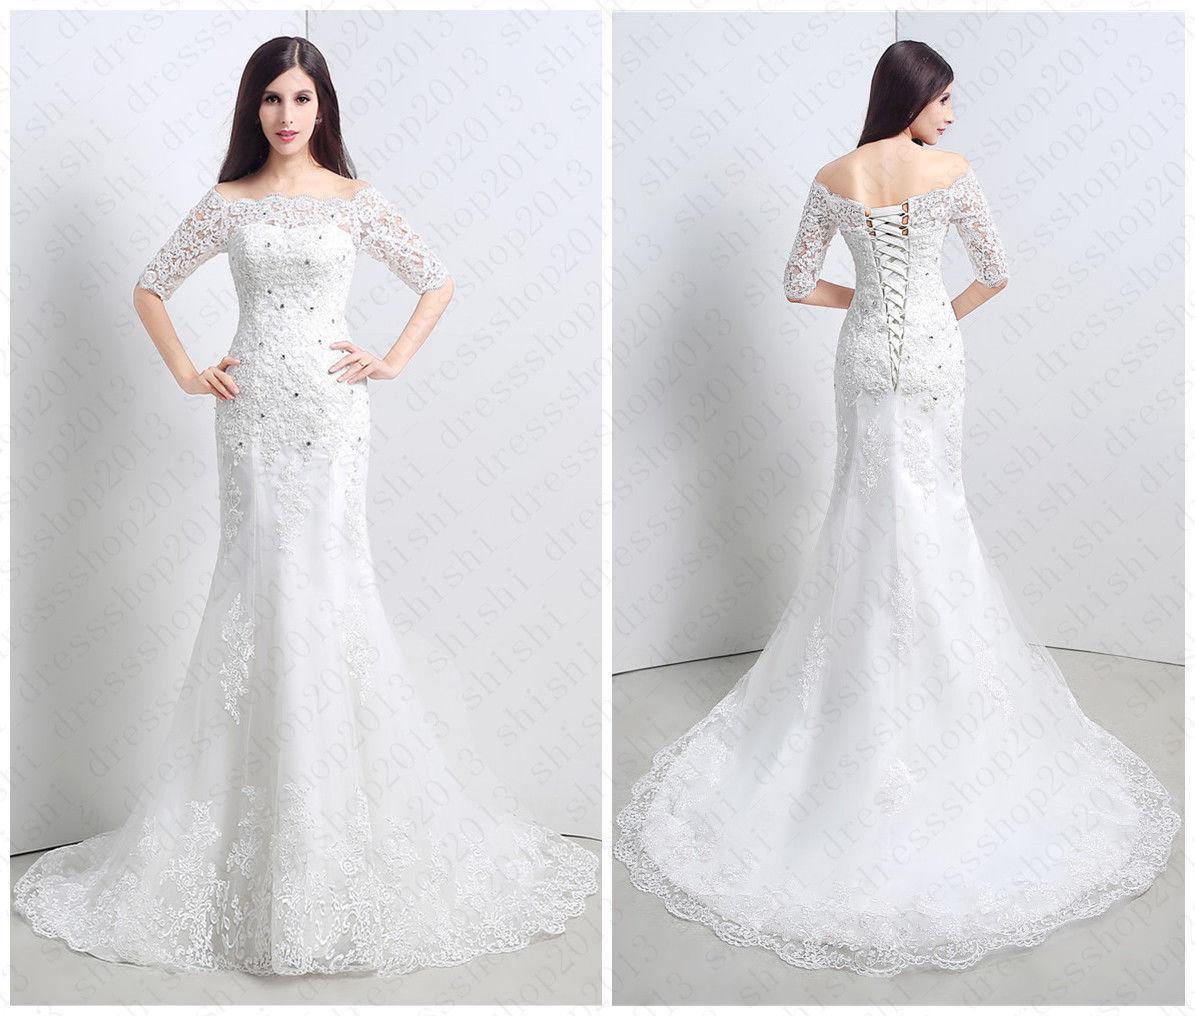 Ivory Half Sleeve Corset f Shoulder Mermaid Lace Bridal